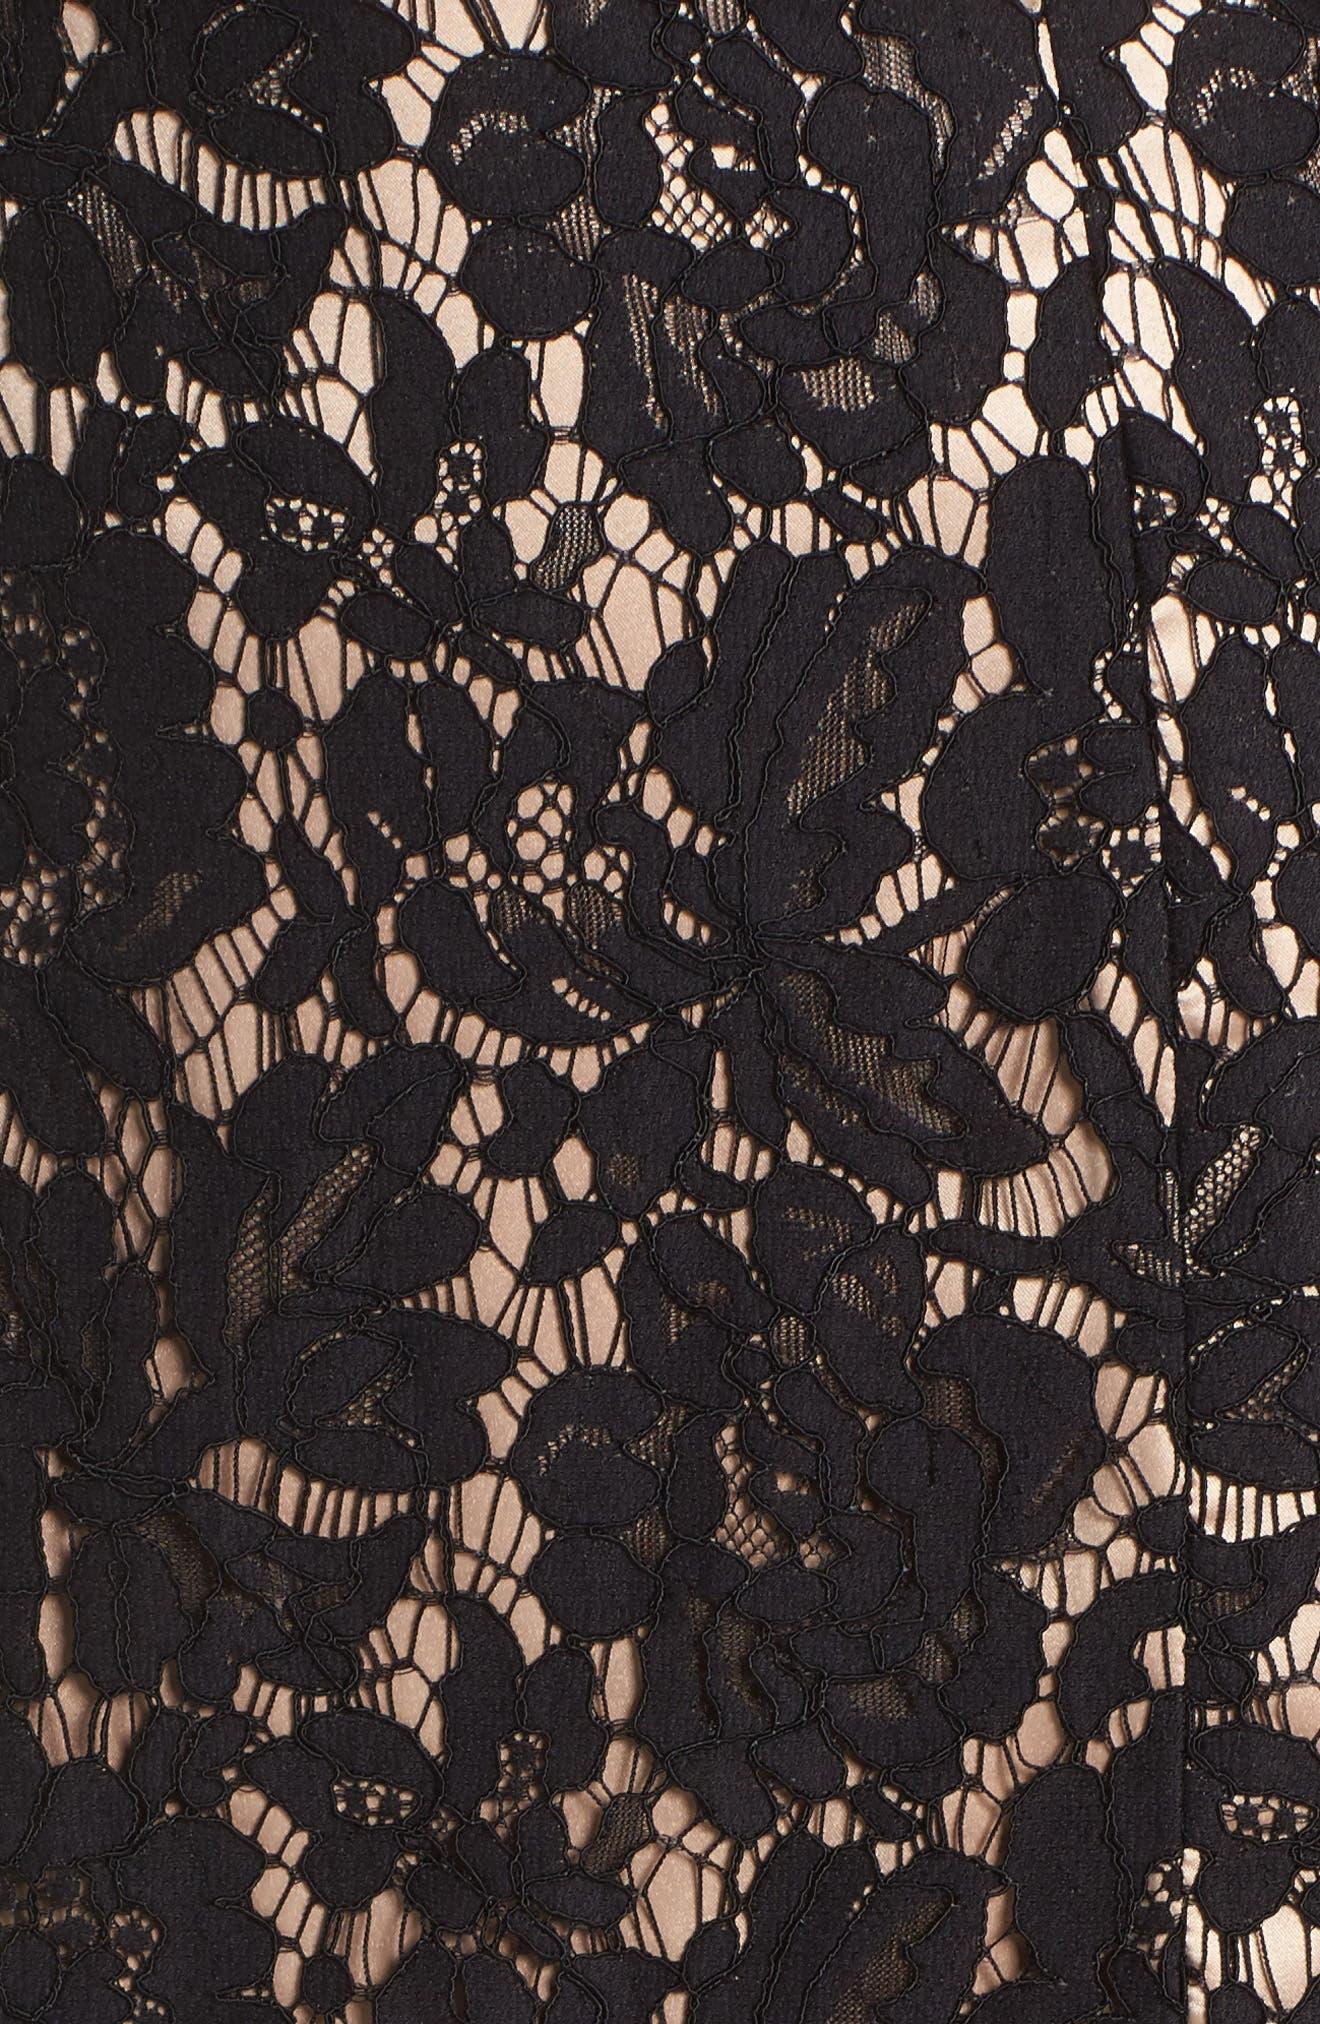 Lace Off the Shoulder Midi Dress,                             Alternate thumbnail 5, color,                             001